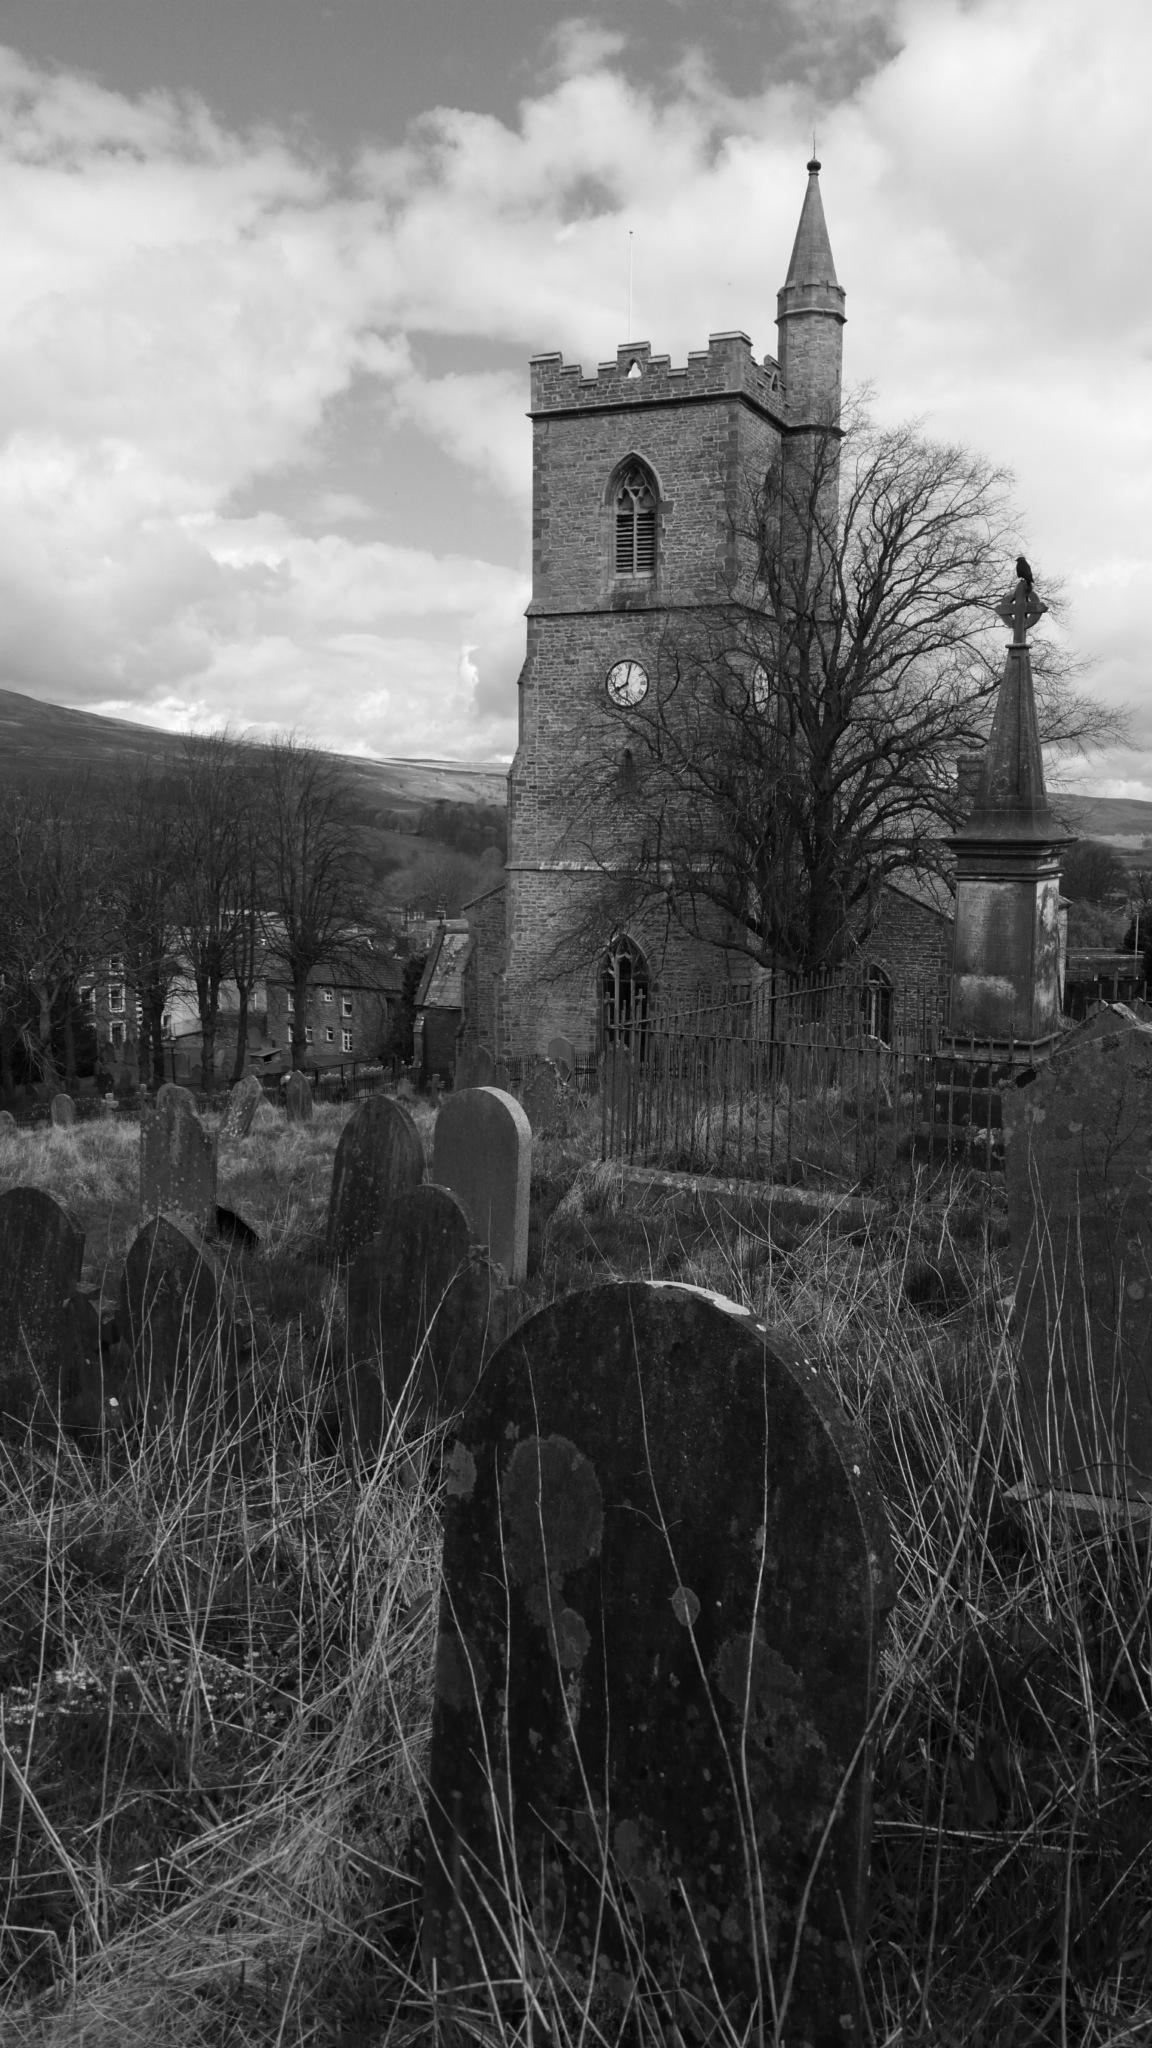 Hawes Church by neiljonesconsulting